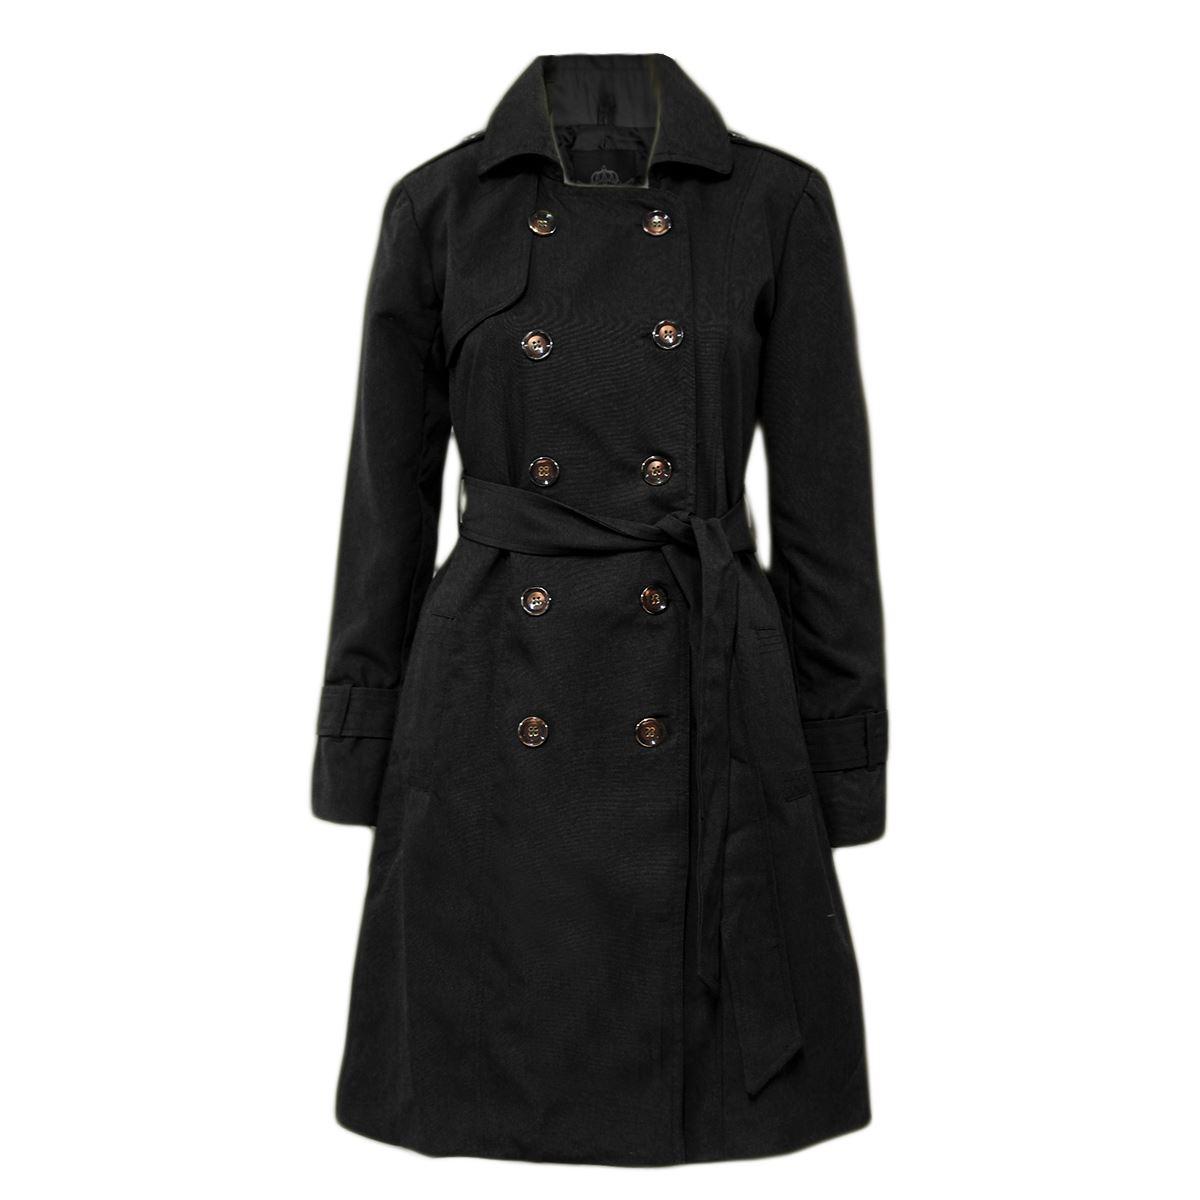 Nouveau Haut Coat Trench Bouton Femmes MAC double breasted Belted Coat Haut d09a20